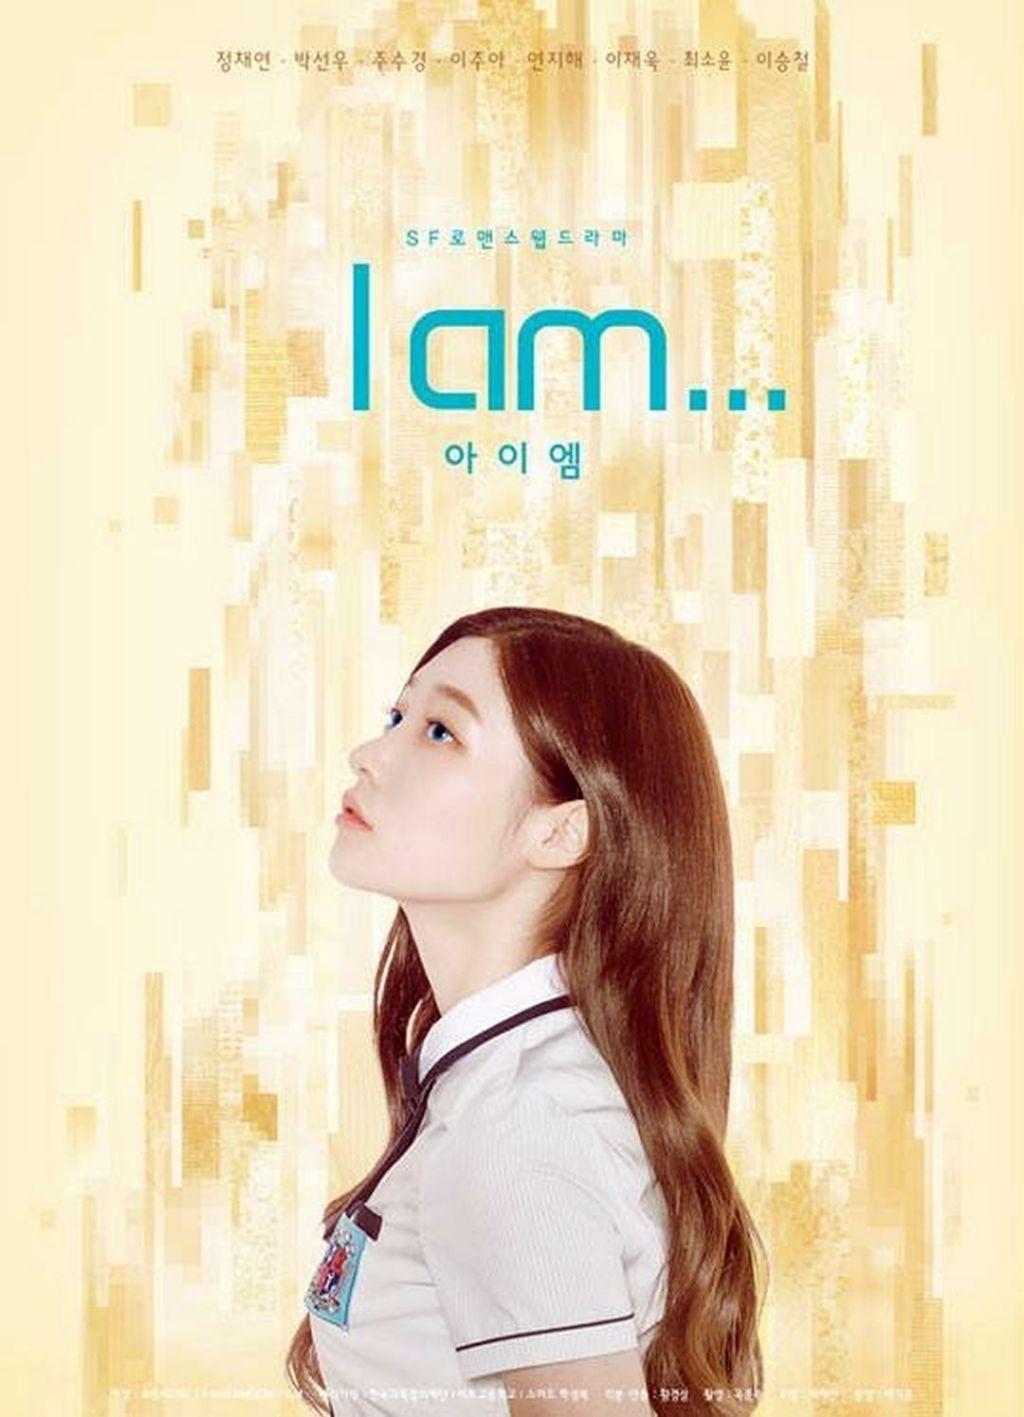 Sinopsis Dan Profil Lengkap Pemeran Mini Drama I Am (2017)